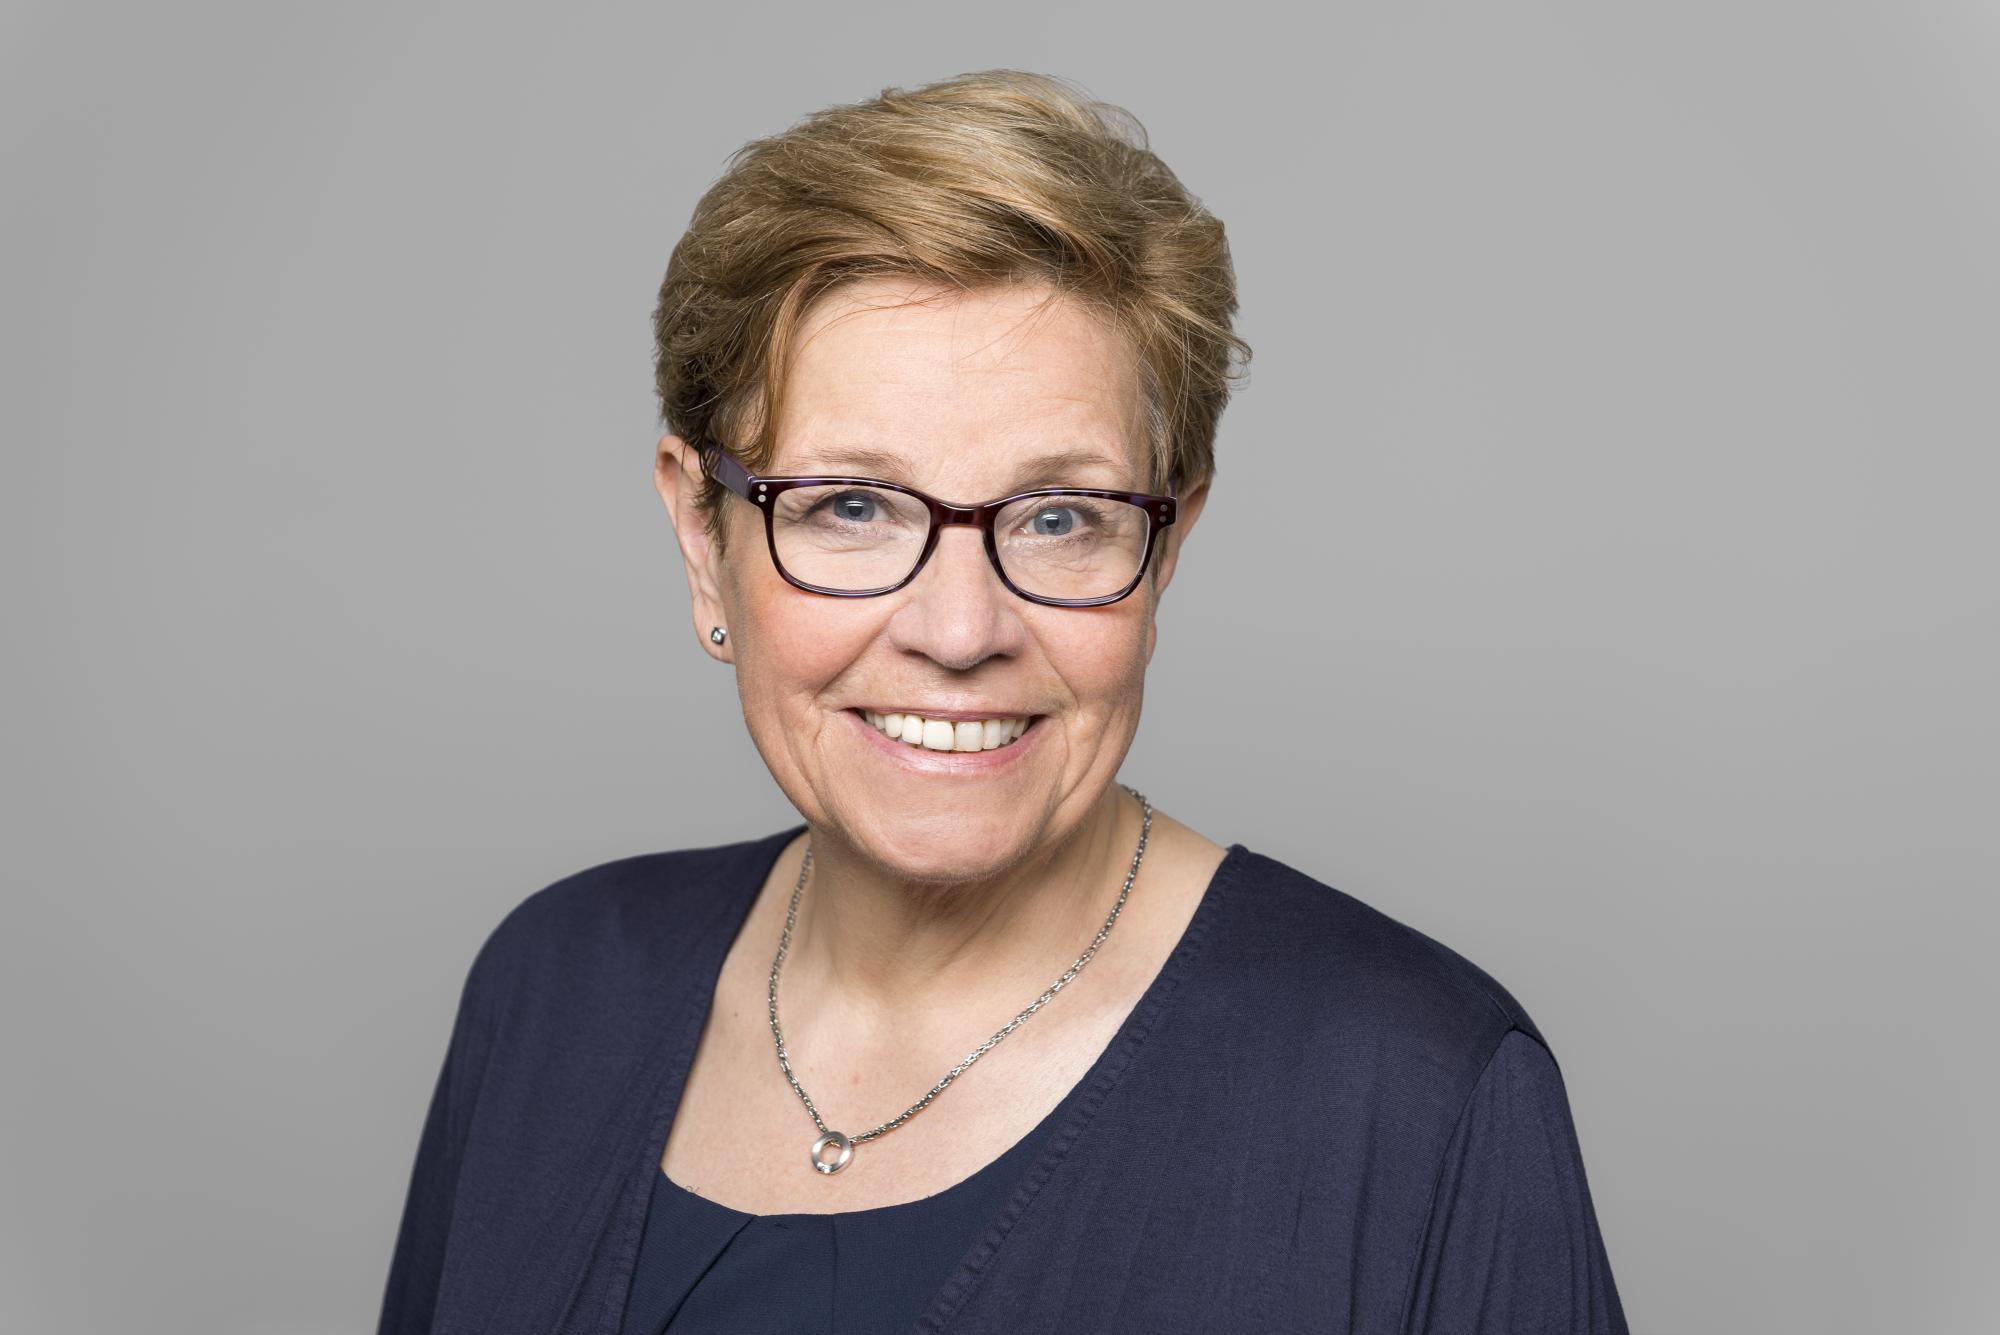 Karin Steinicke